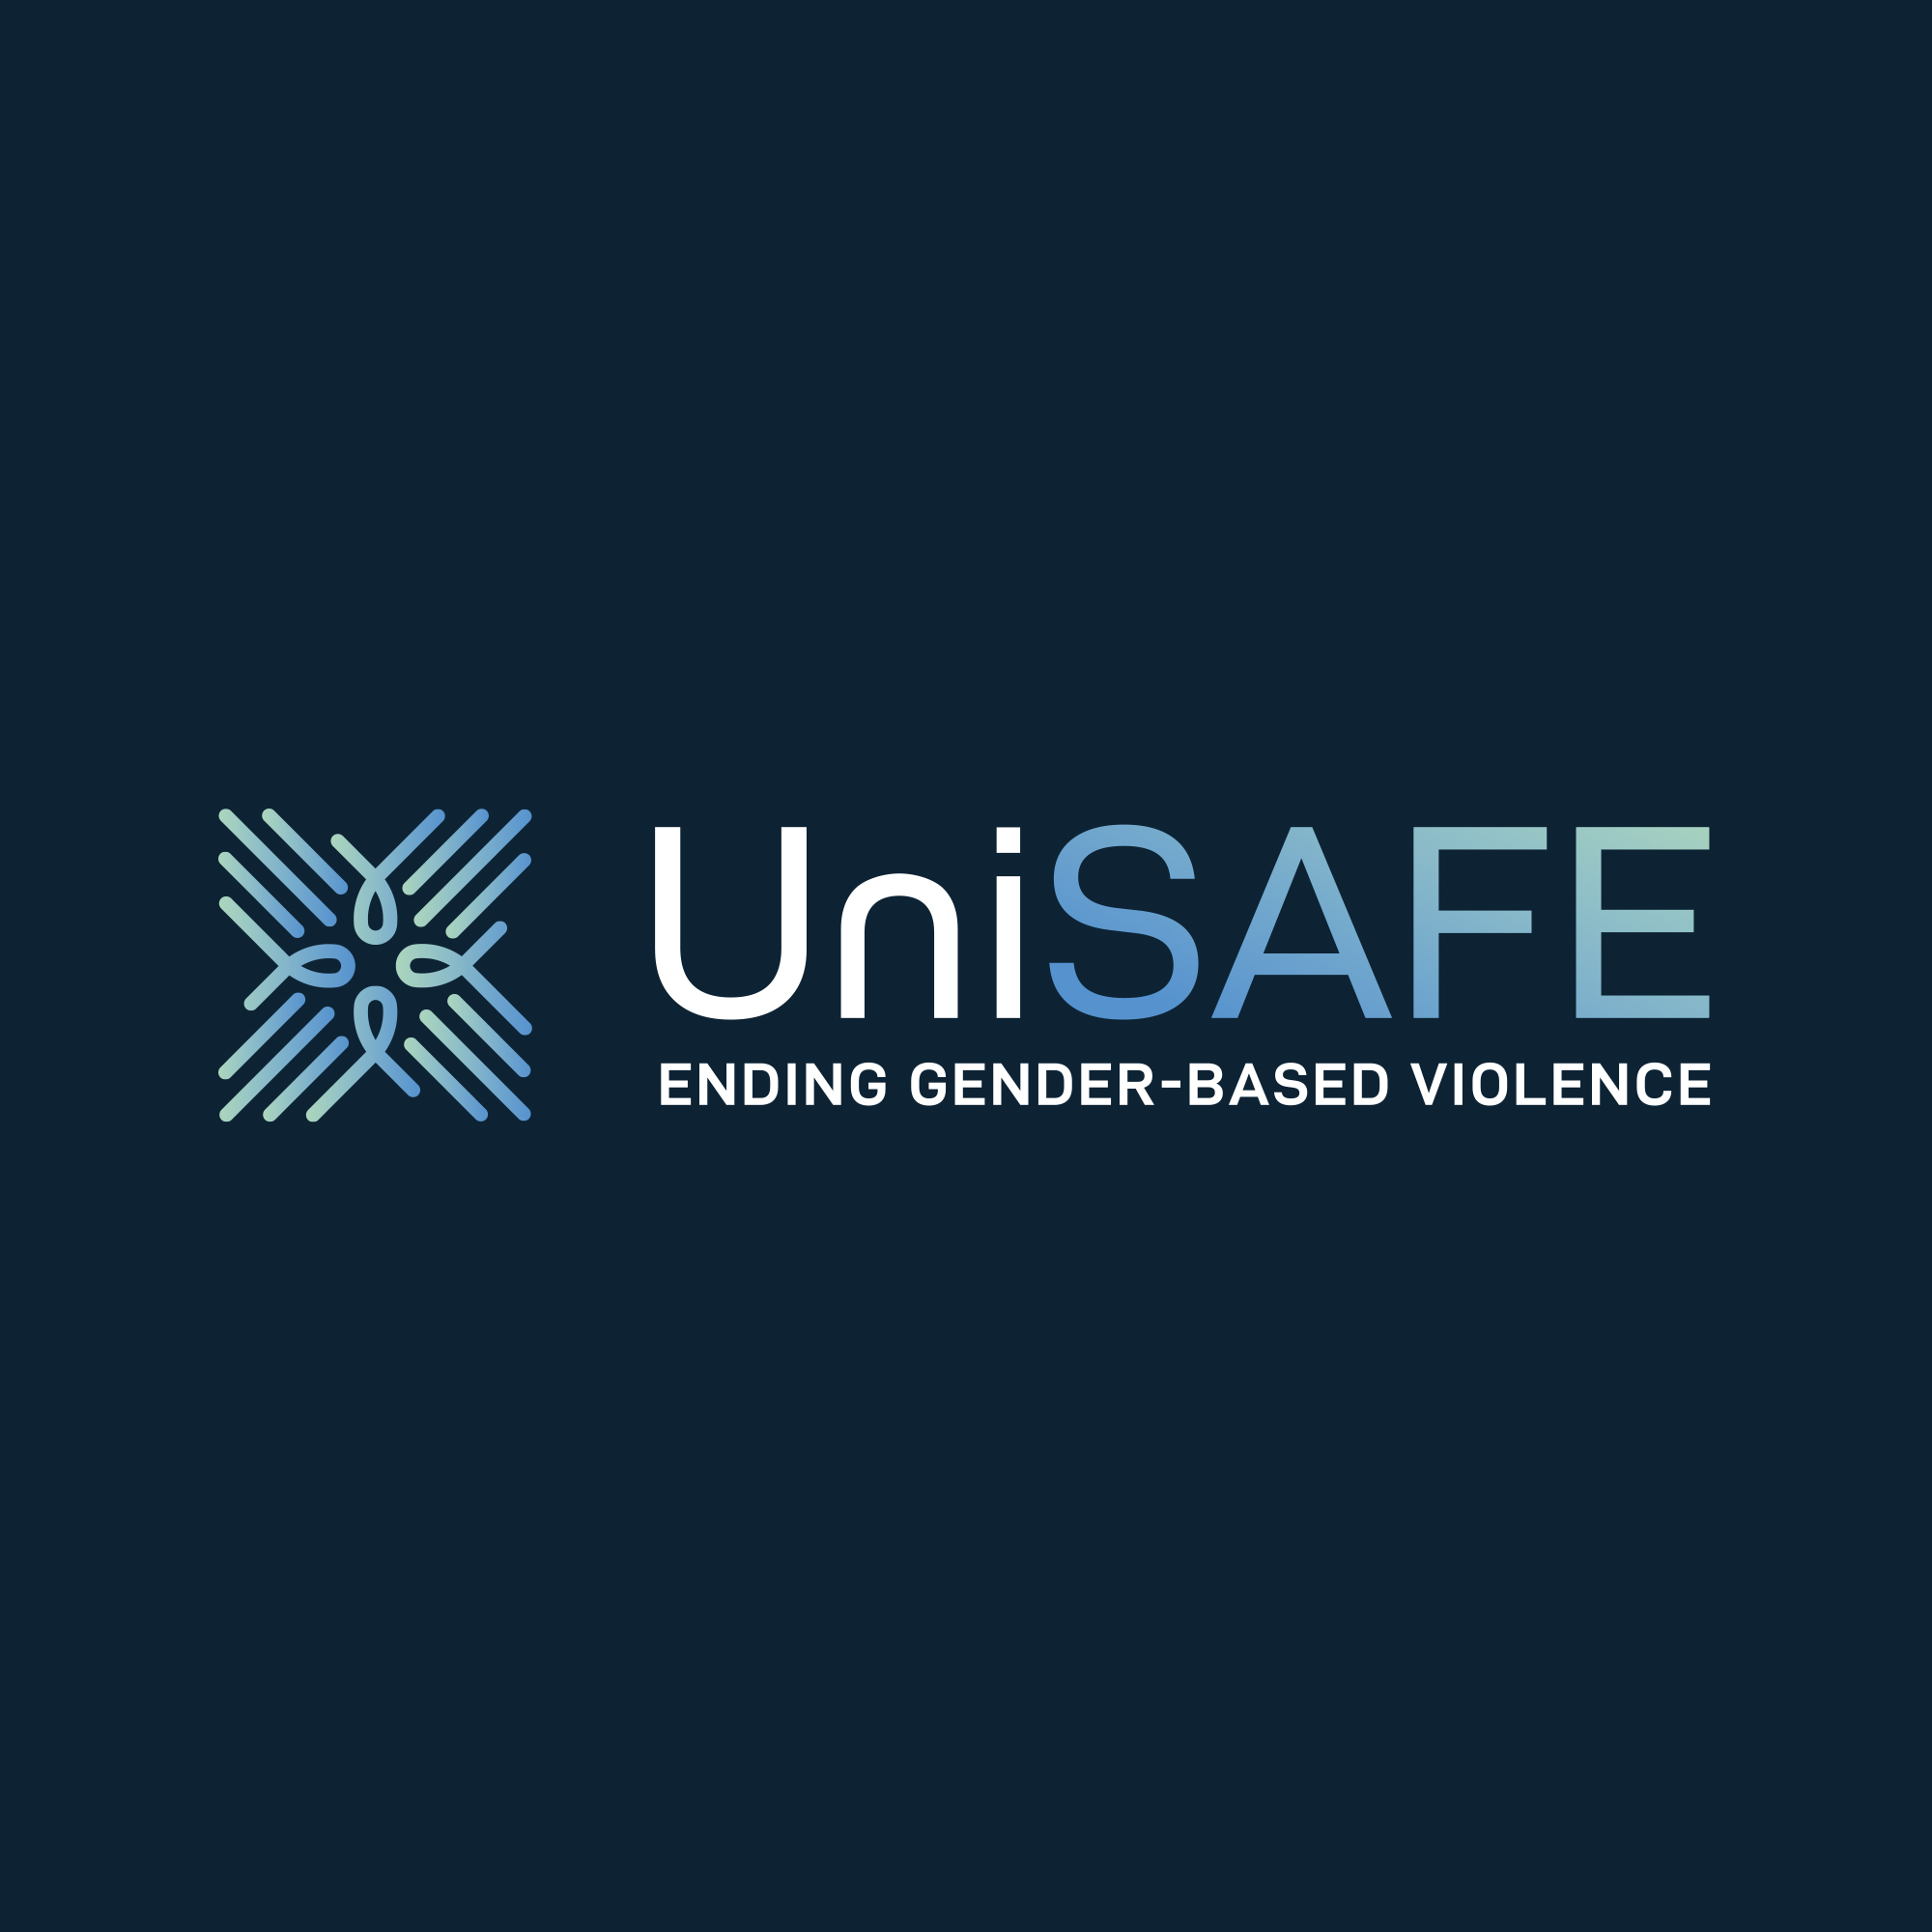 UniSAFE-LOGO-bluebg